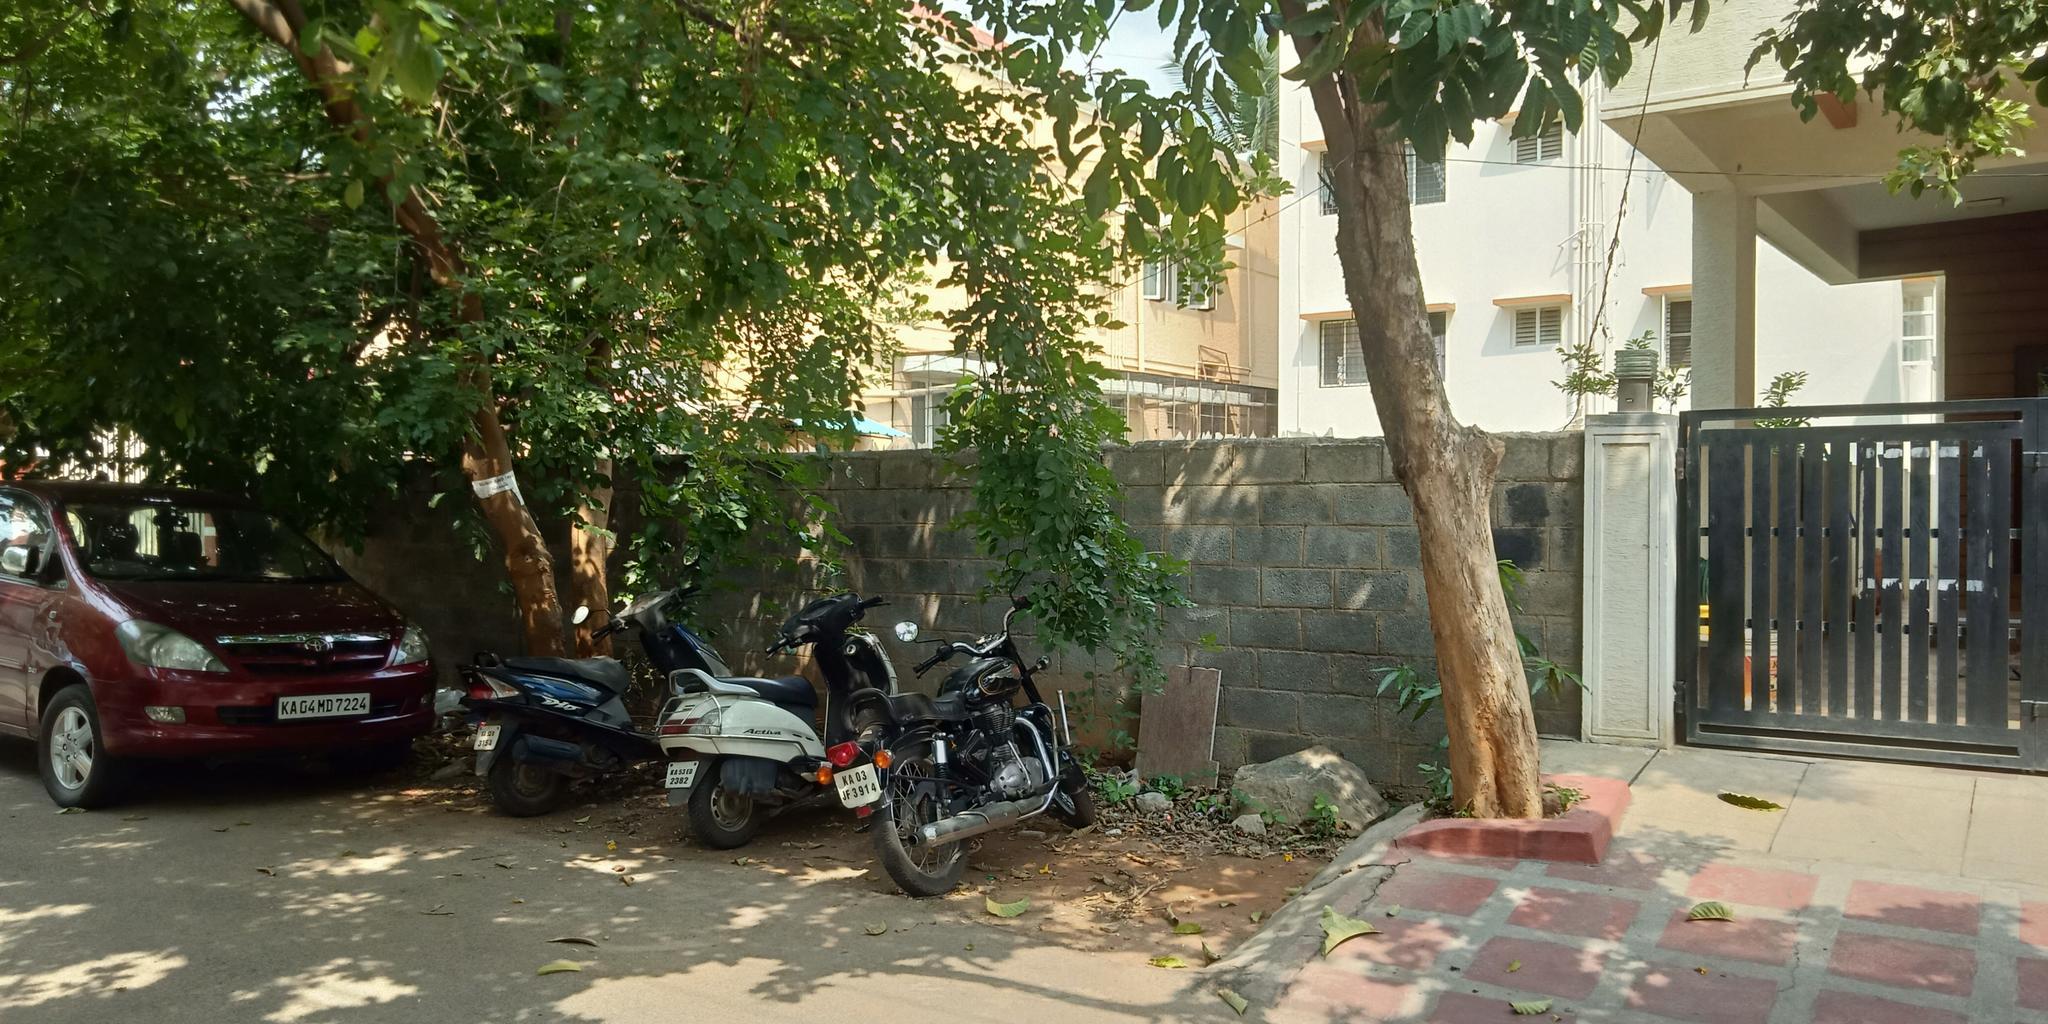 1560406302_banner_bangalore_40.jpeg